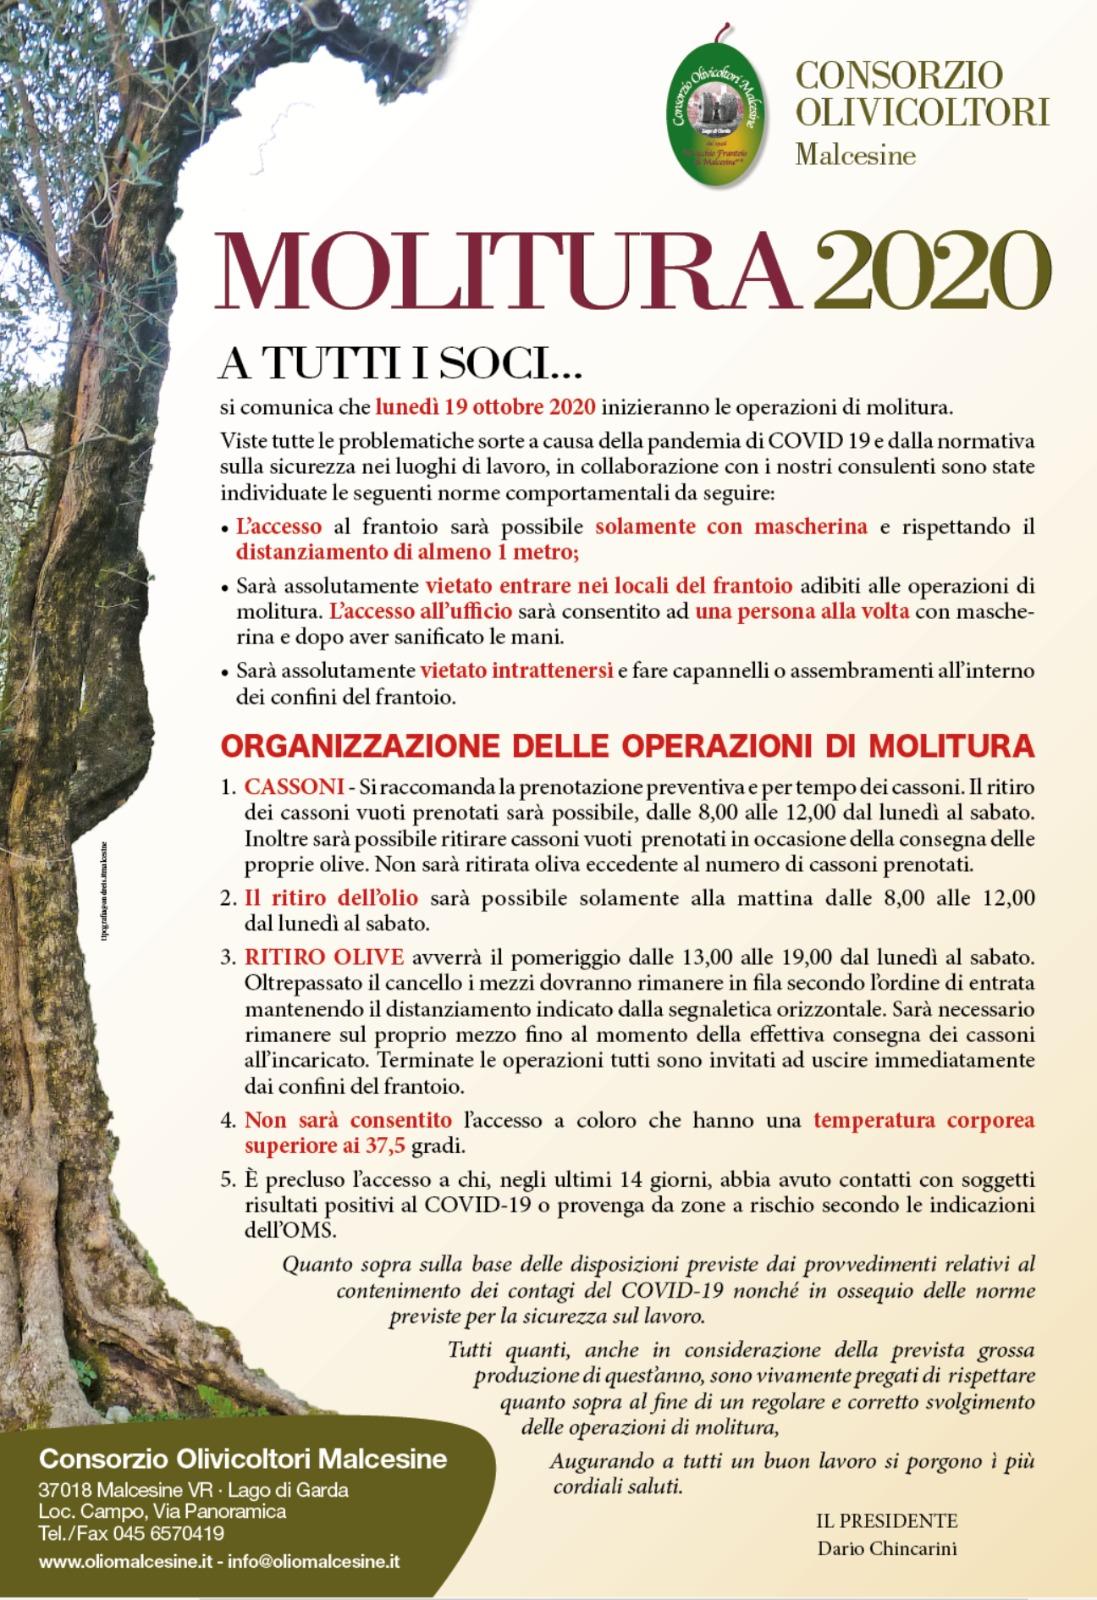 MOLITURA 2020